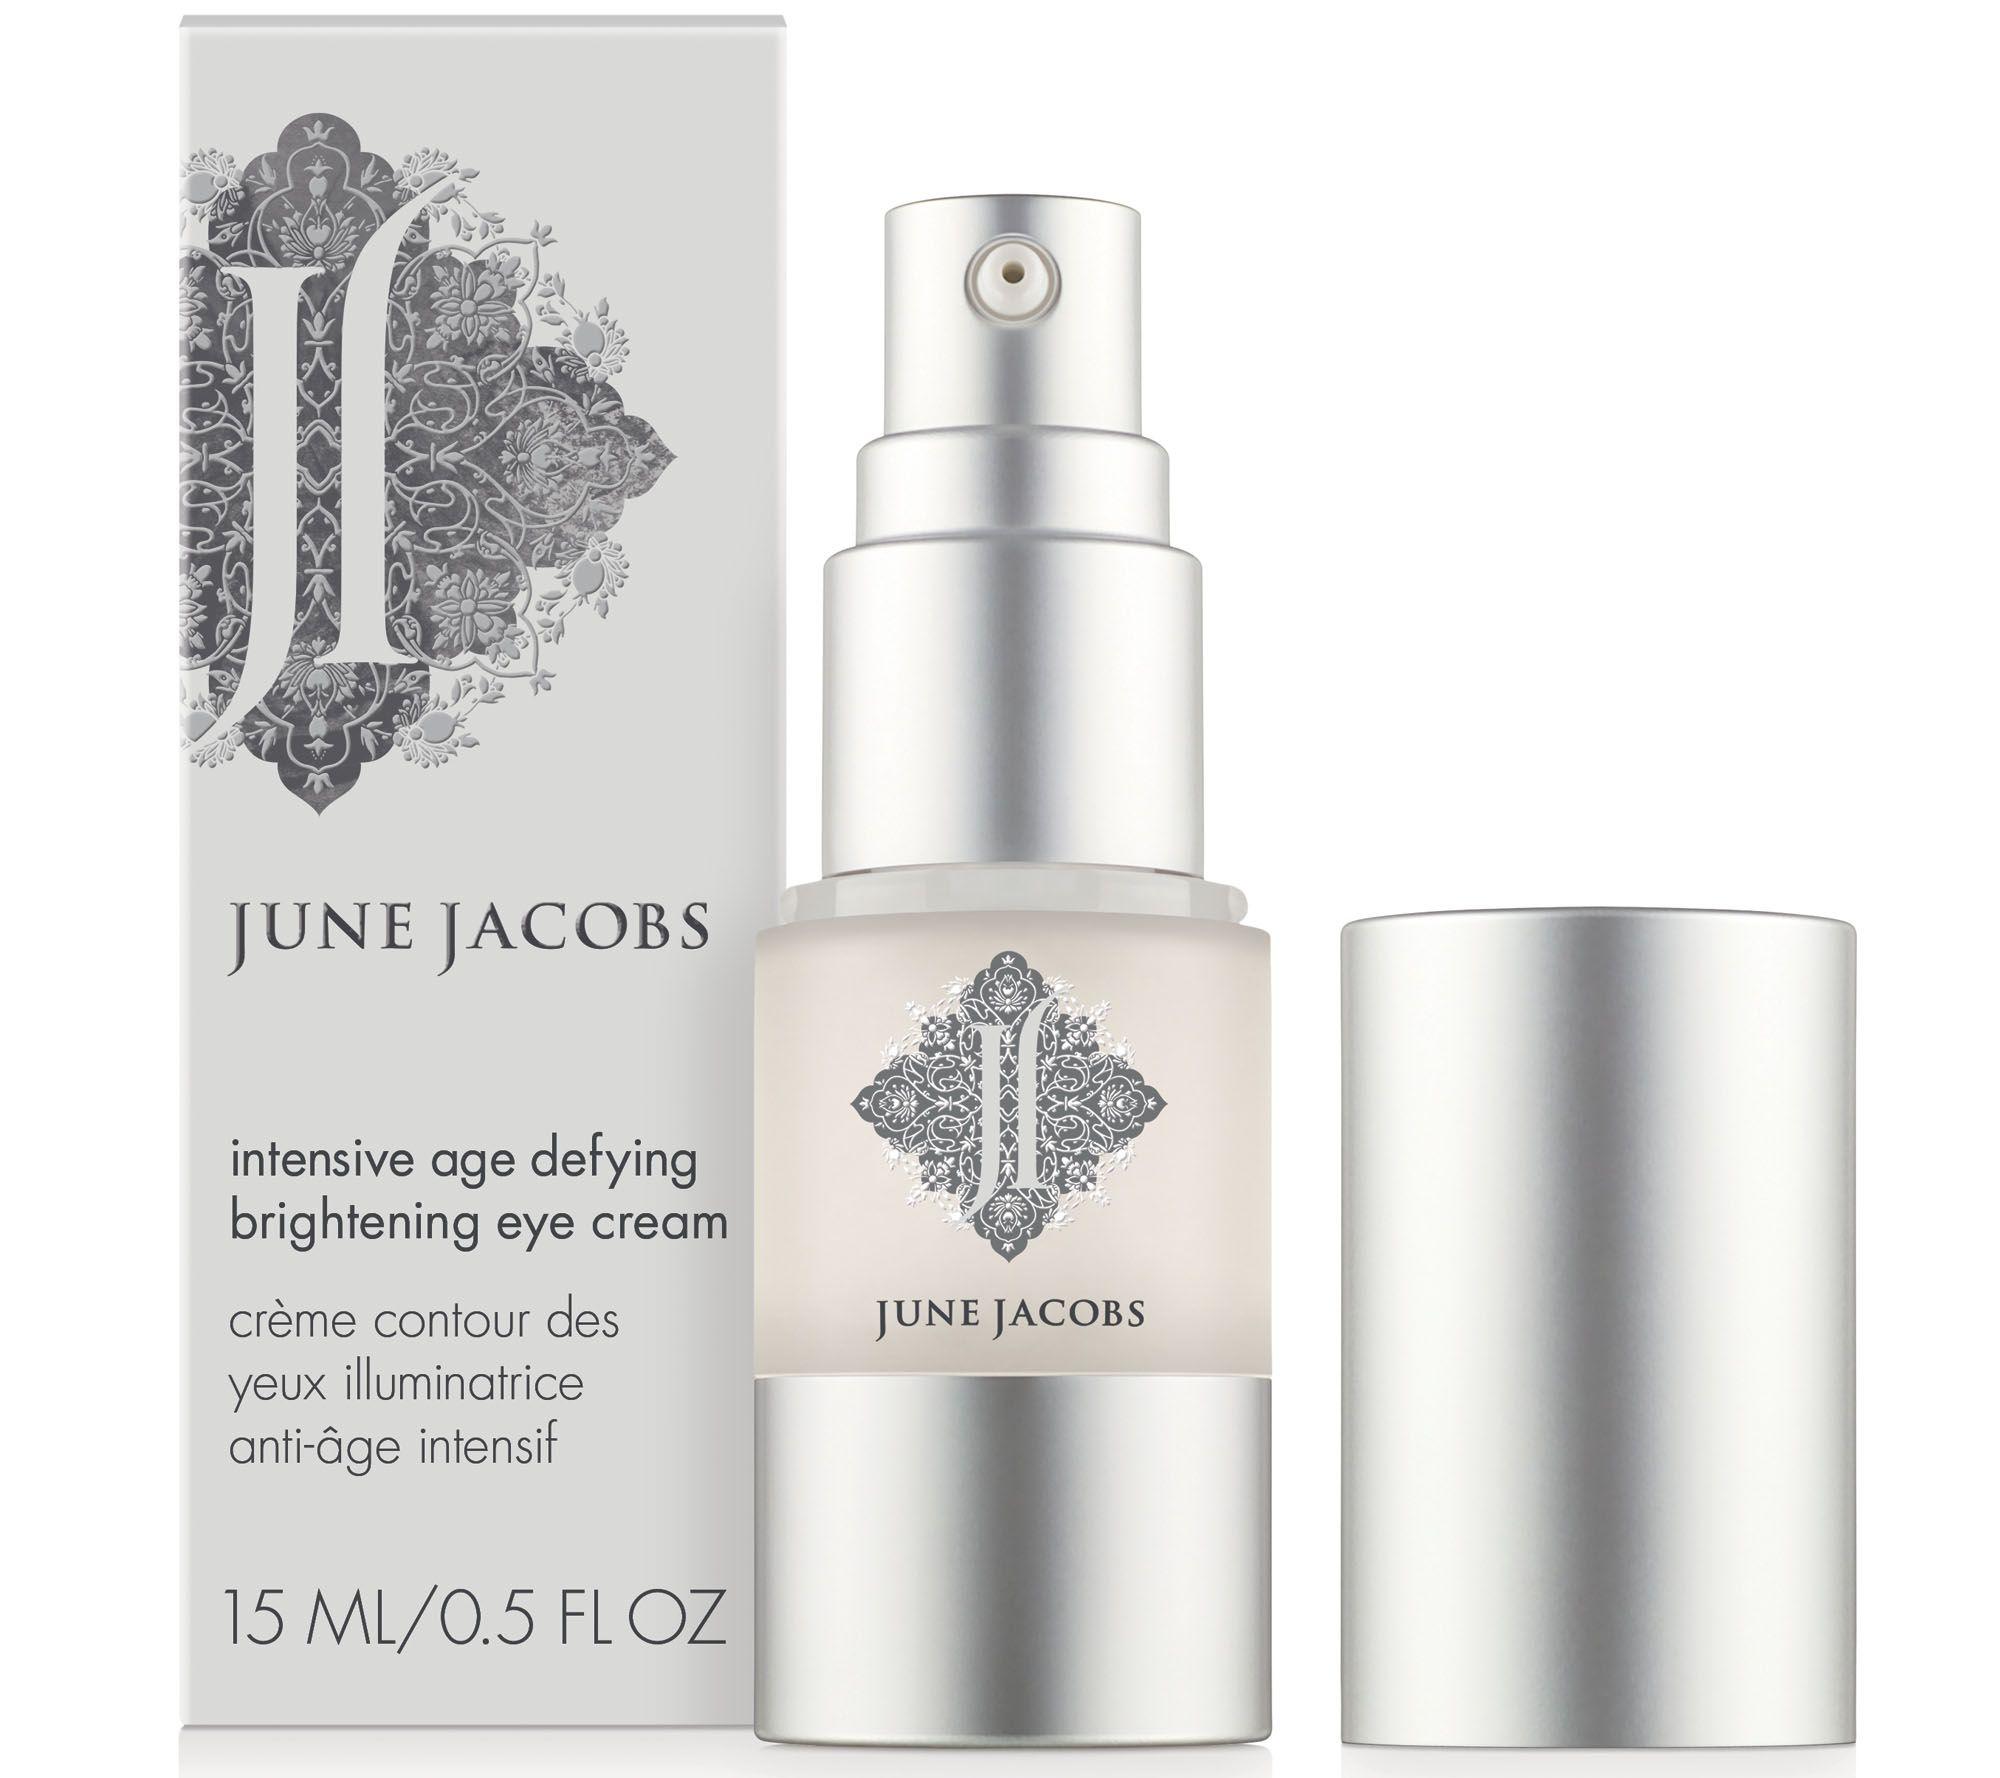 Blue Lizard - Australian Sunscreen Face Daily Moisturizer Fragrance Free 30 SPF - 3 oz.